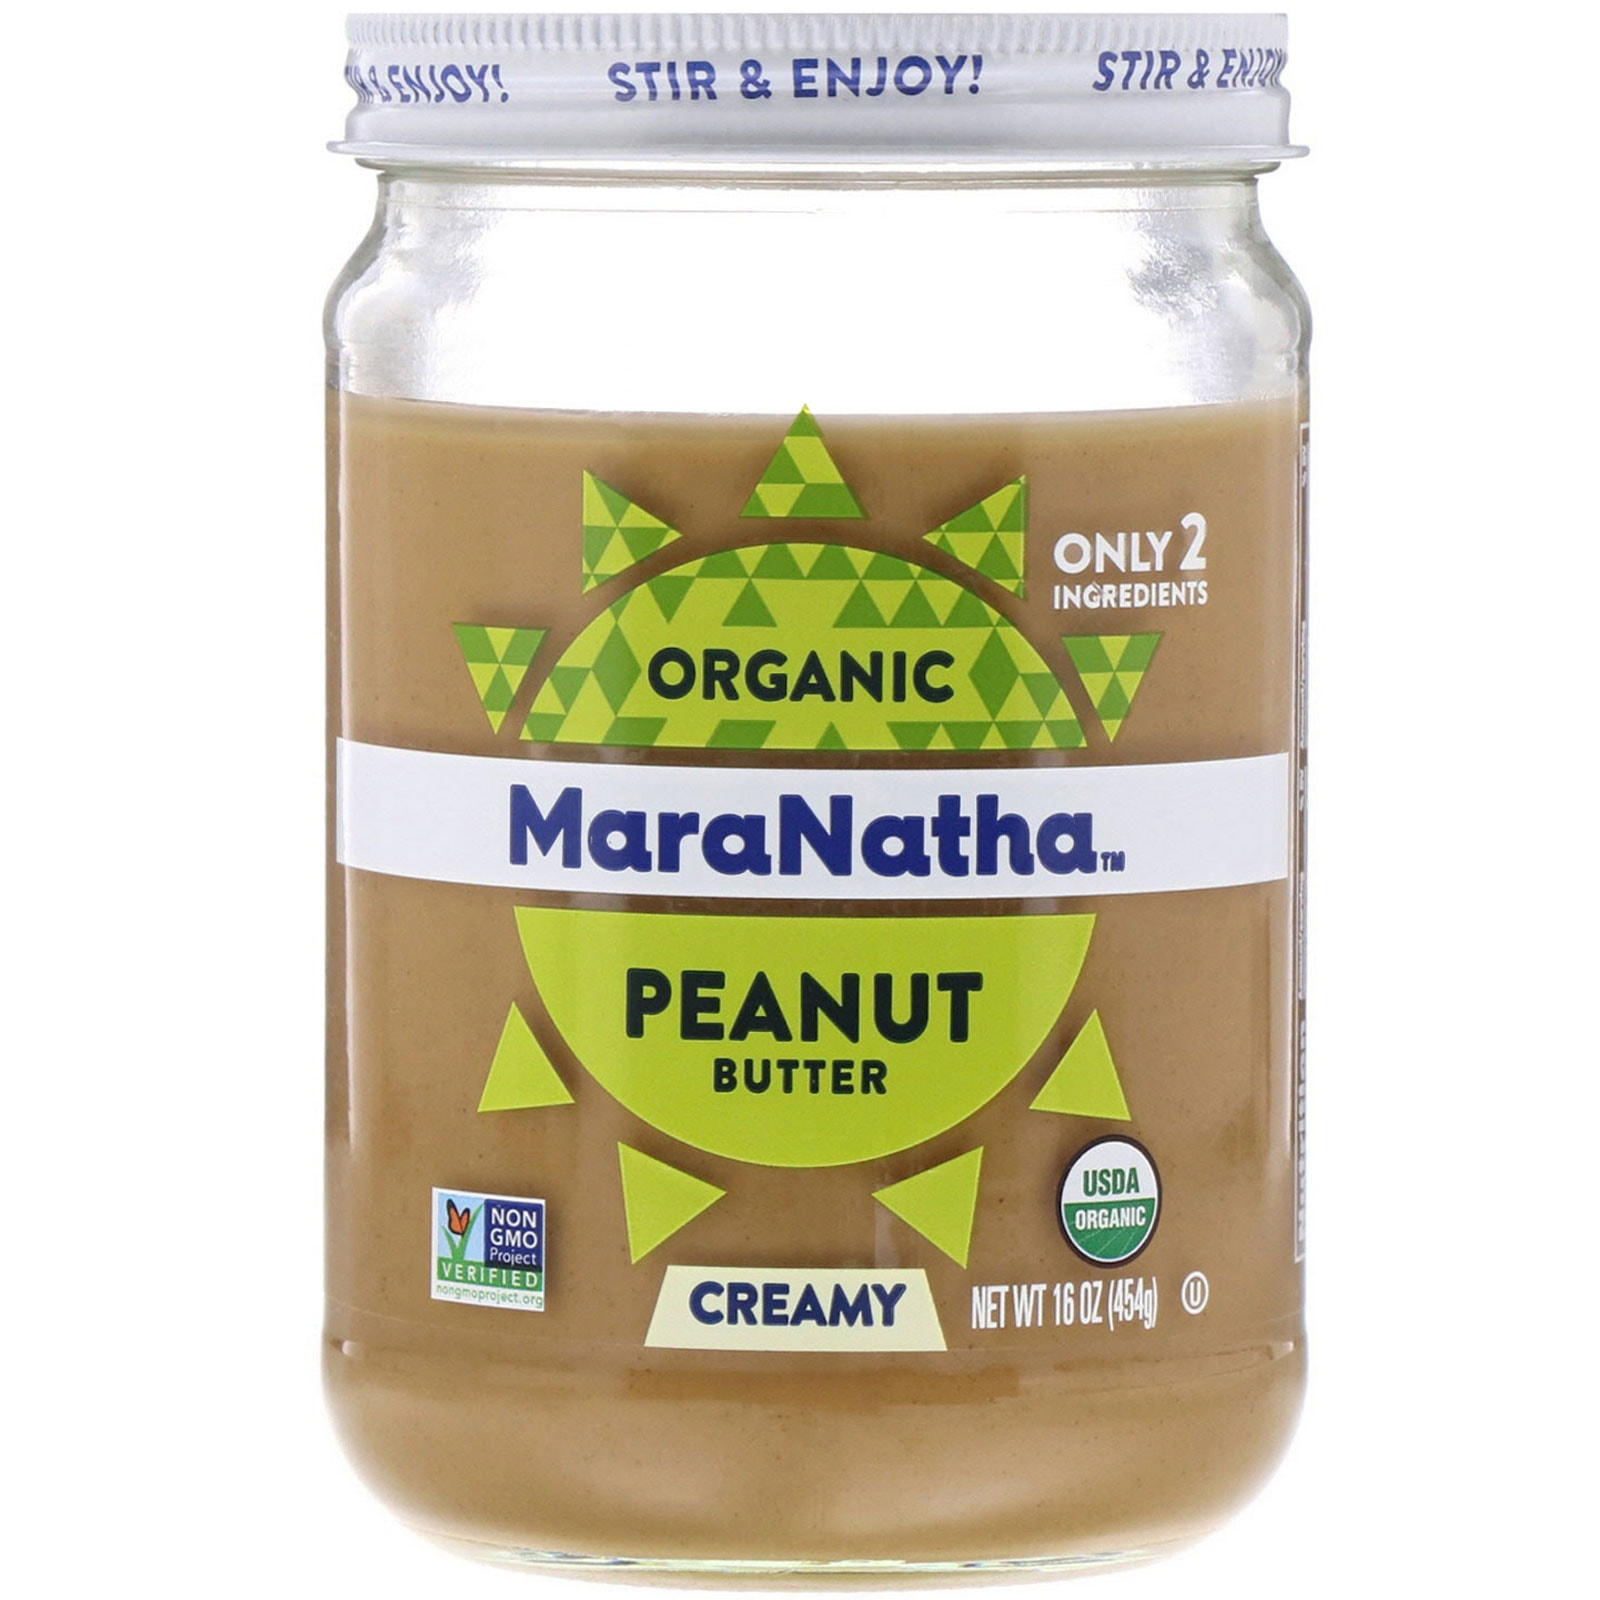 MaraNatha Organic Peanut Butter, Creamy